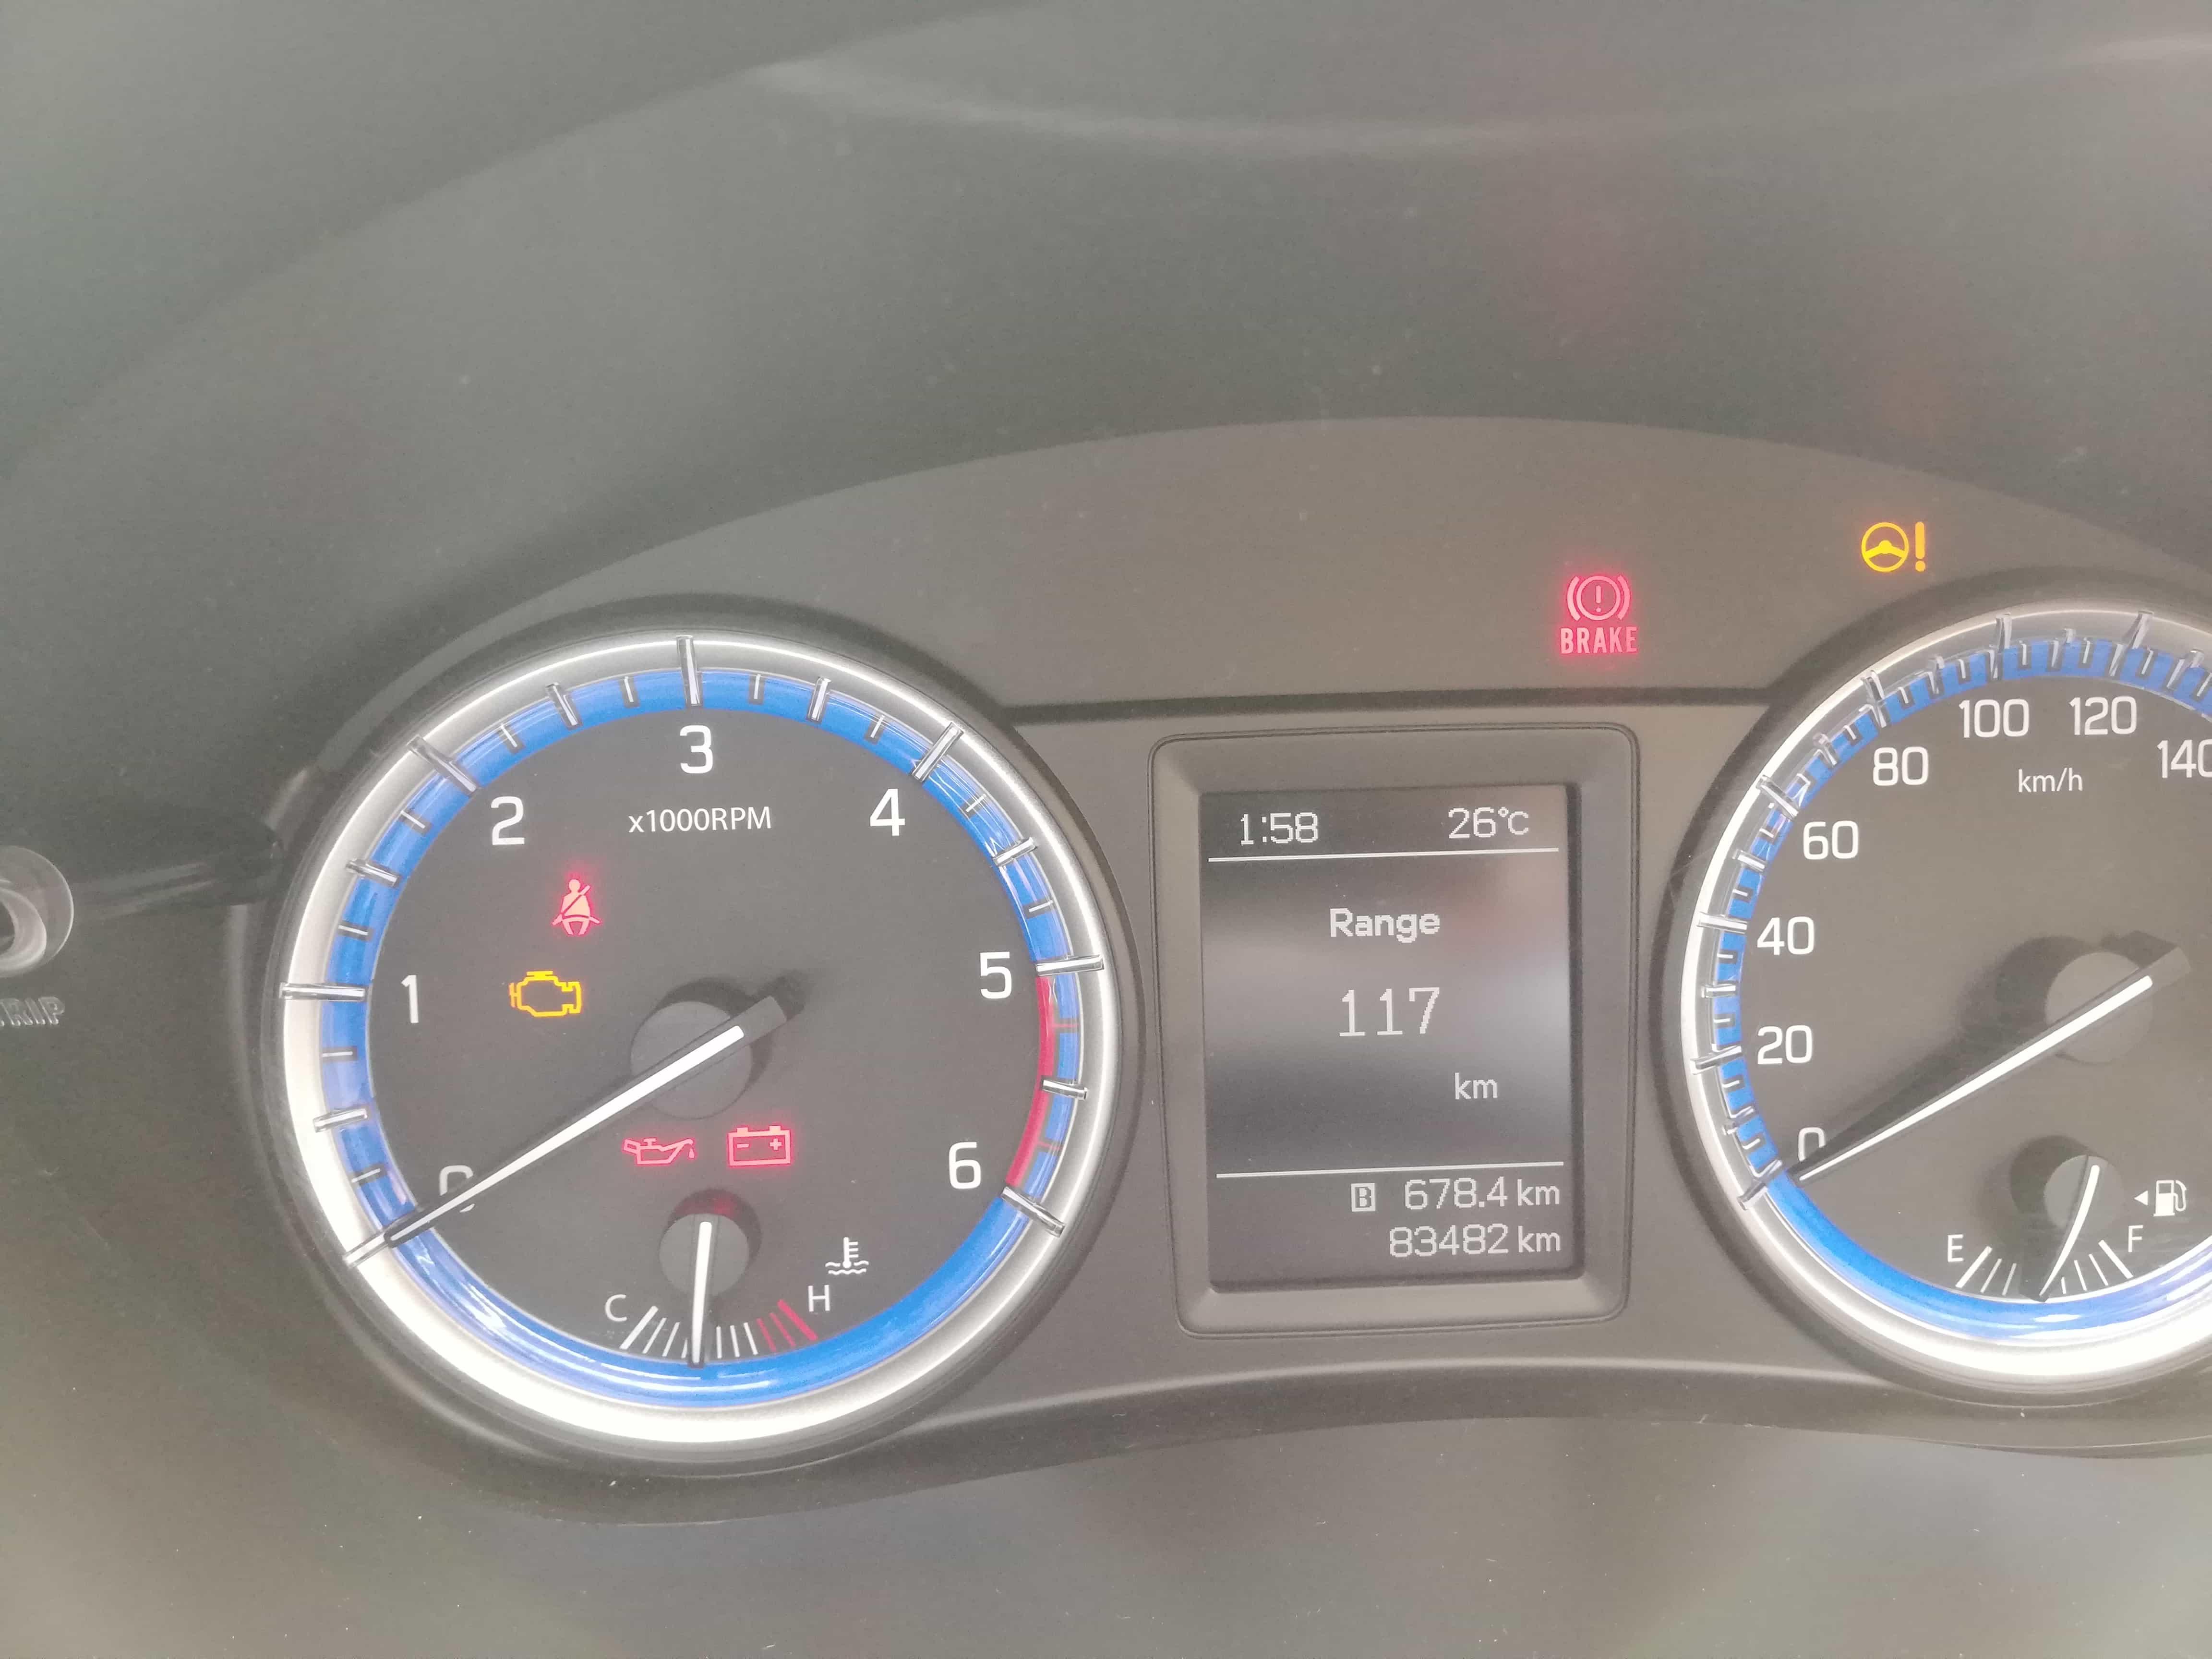 2016 Used Maruti Suzuki S Cross 1.3 SIGMA